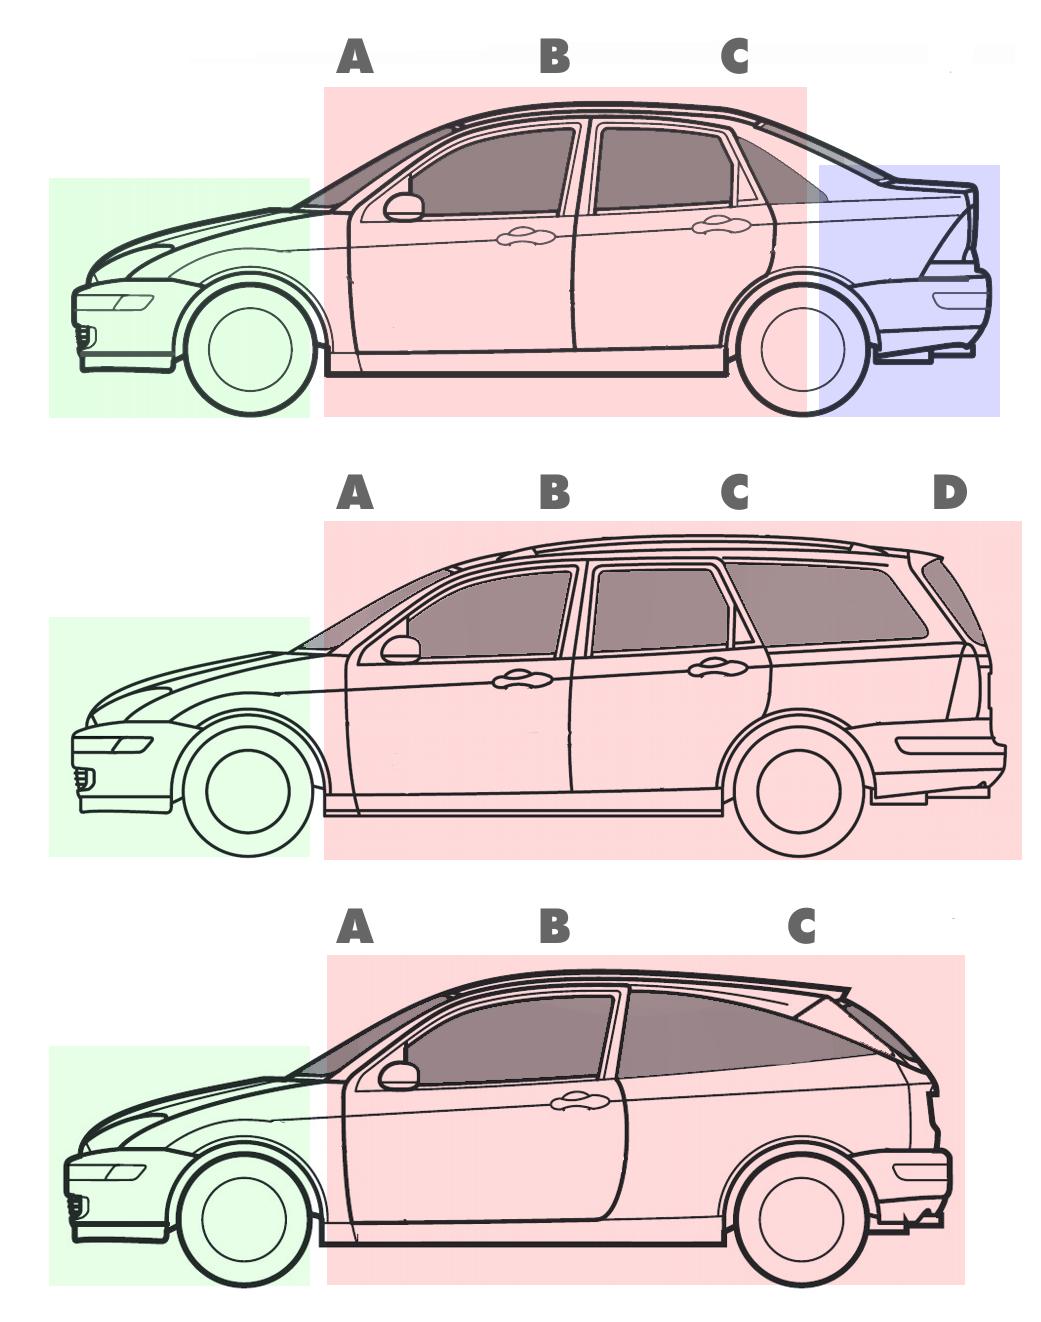 Kombi, Station Wagon, Estate Car